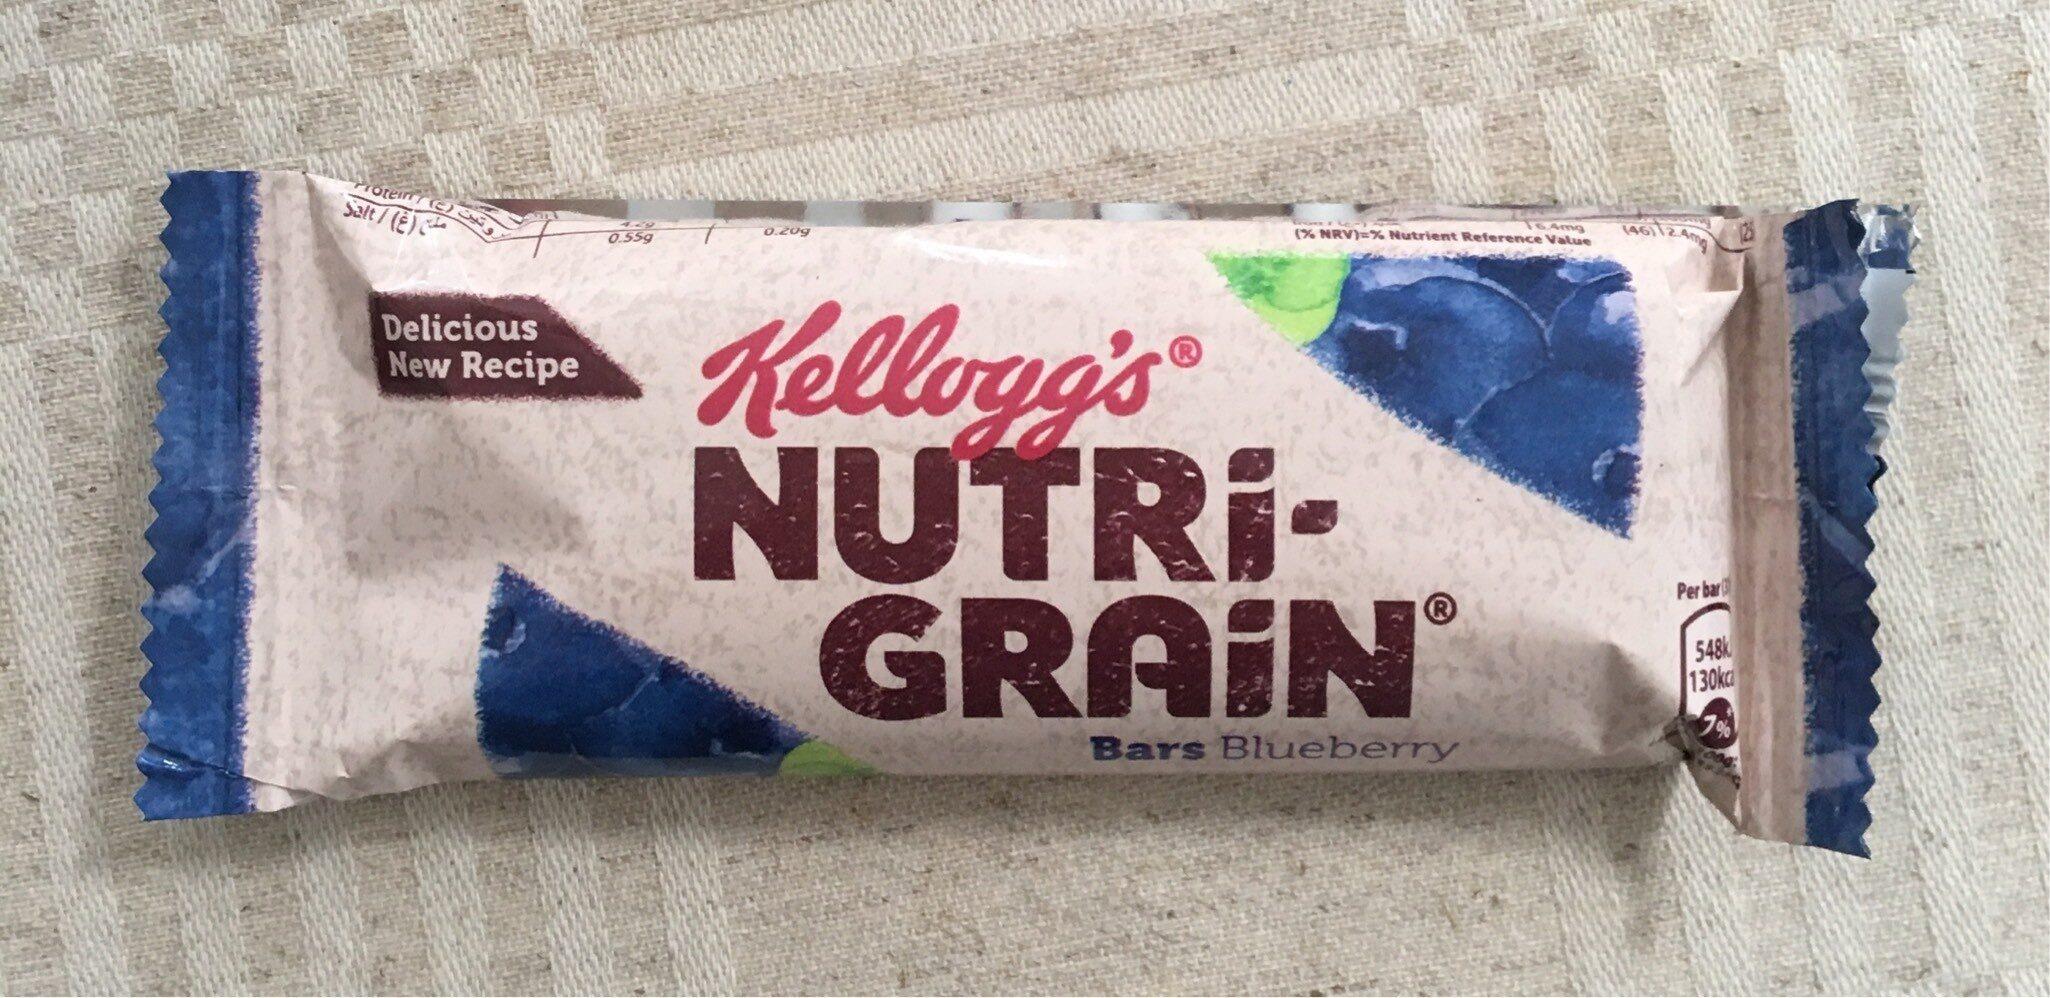 Nutri grain bar, blueberry flavour - Product